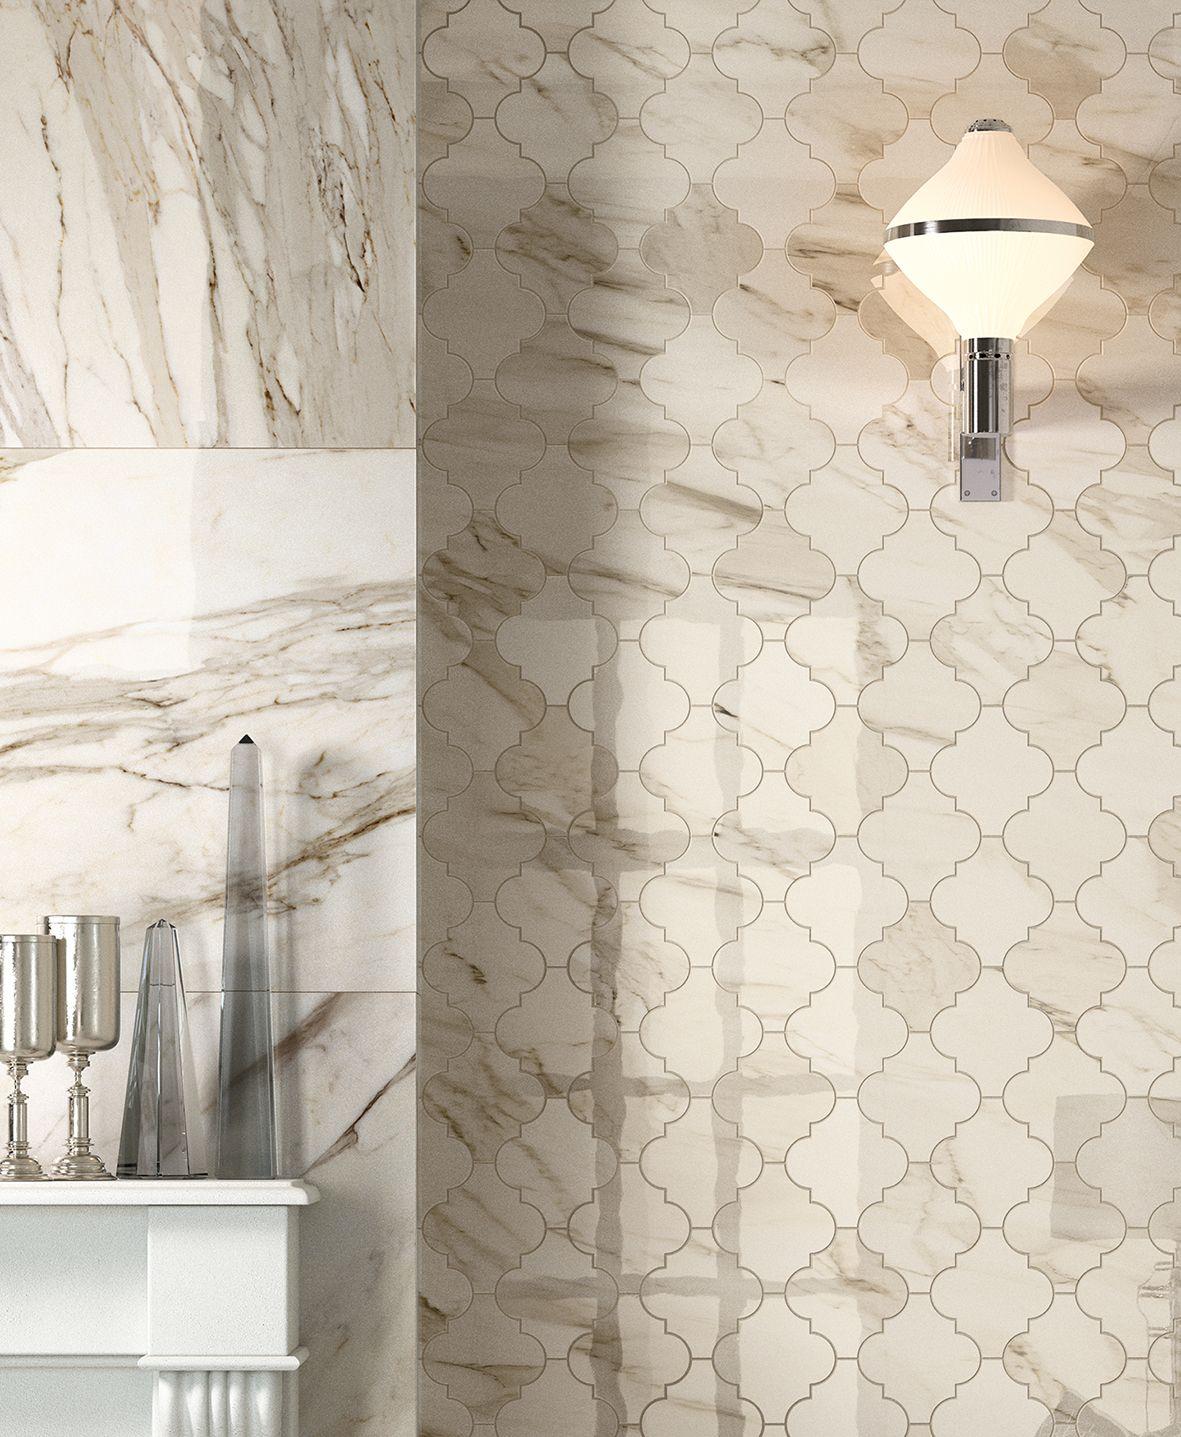 Forogres Mozaic Imperial Mozaic, Flooring, Tiles